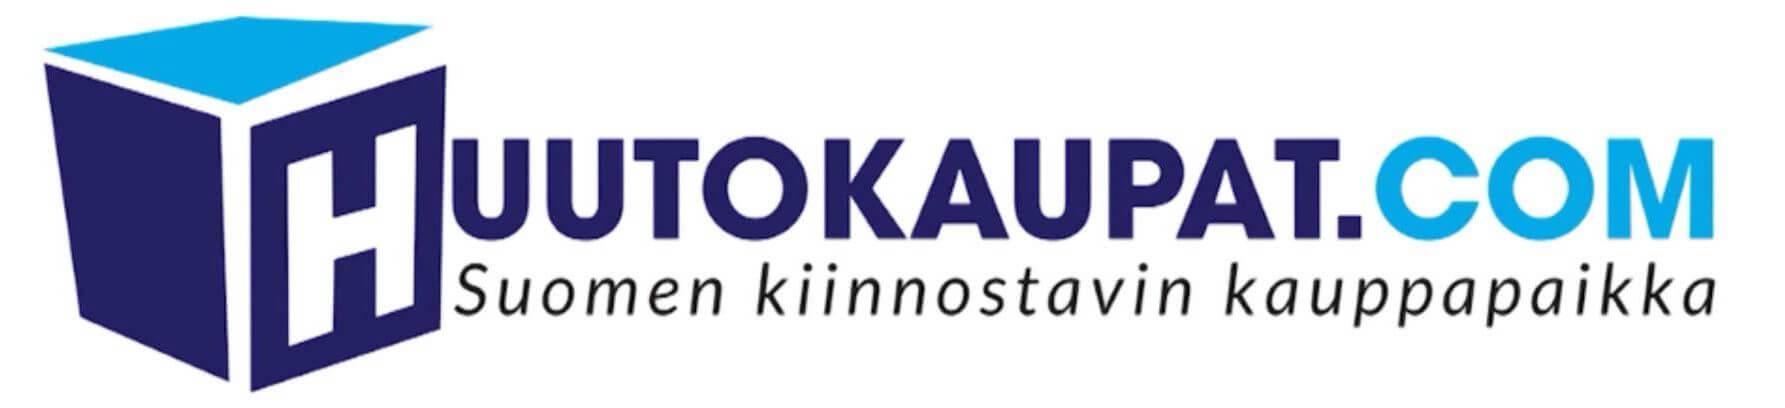 Huutokaupat.com.